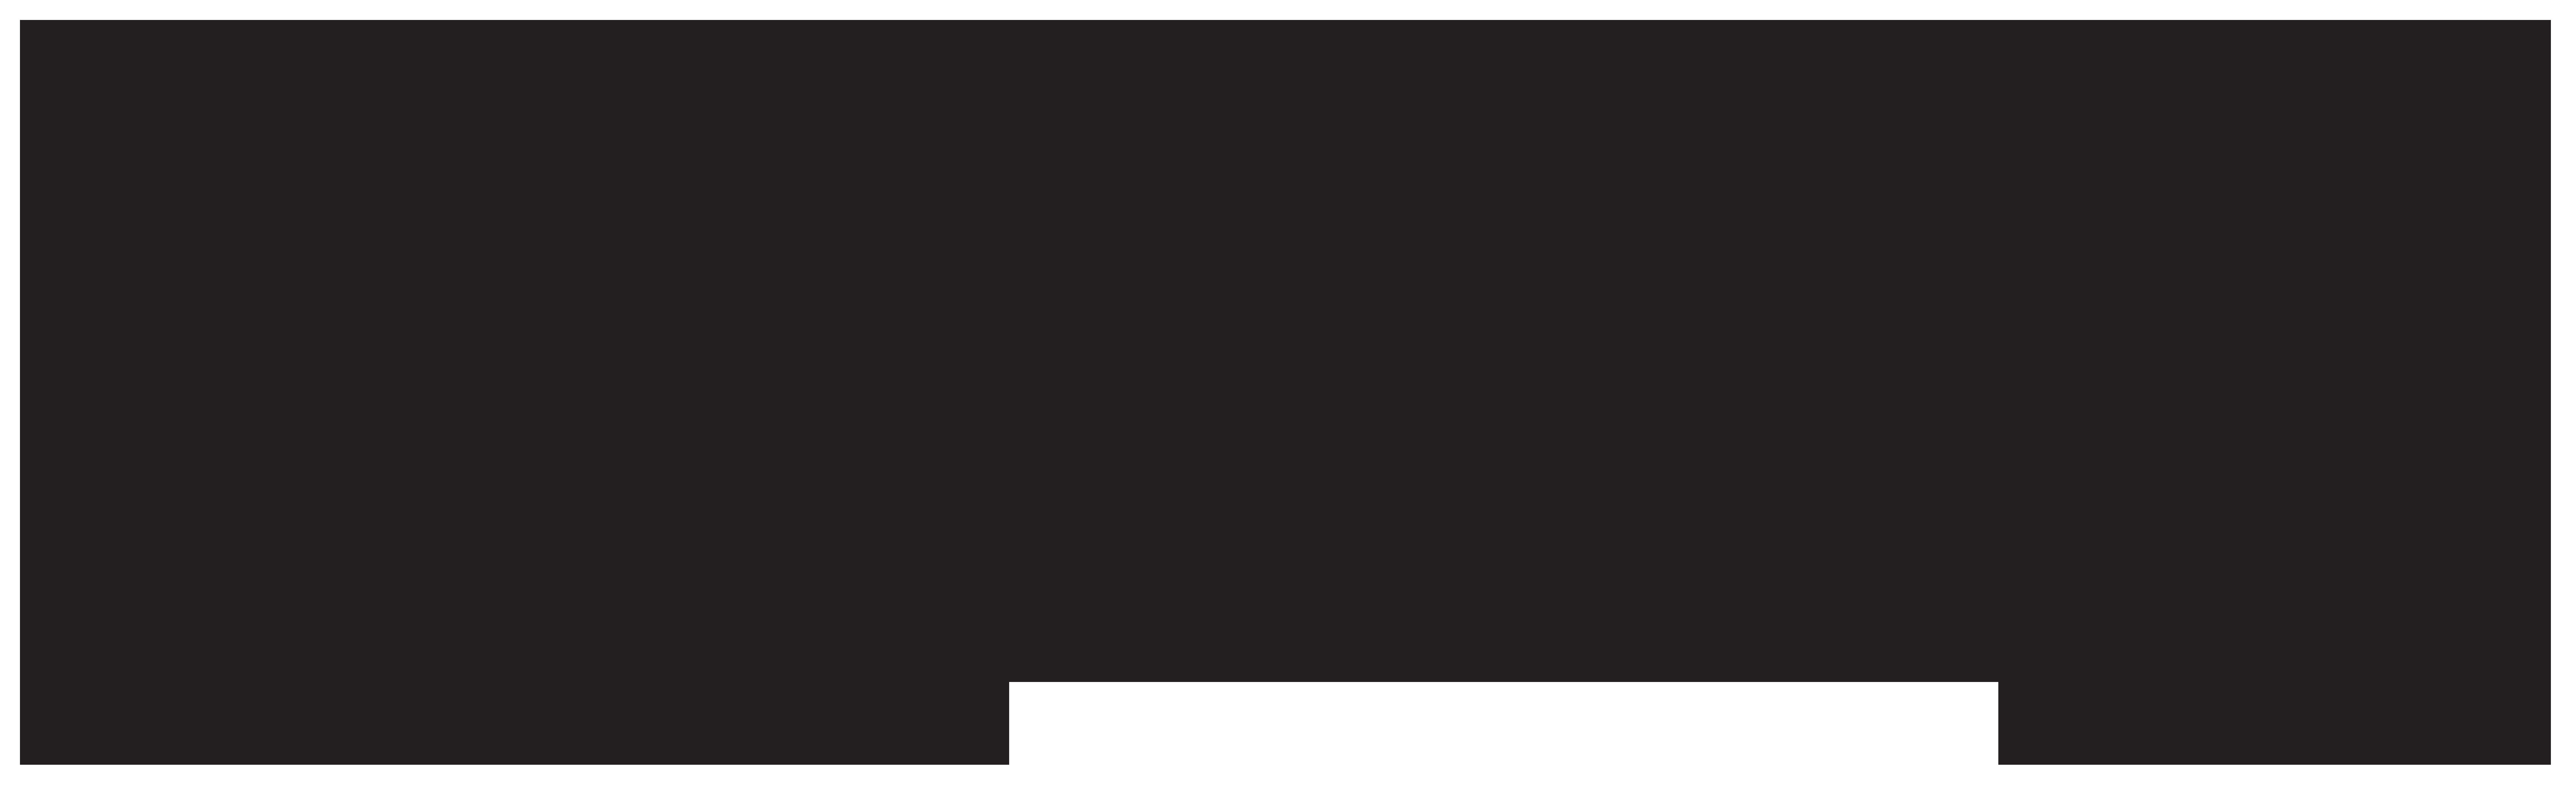 Santa Sledge Vector